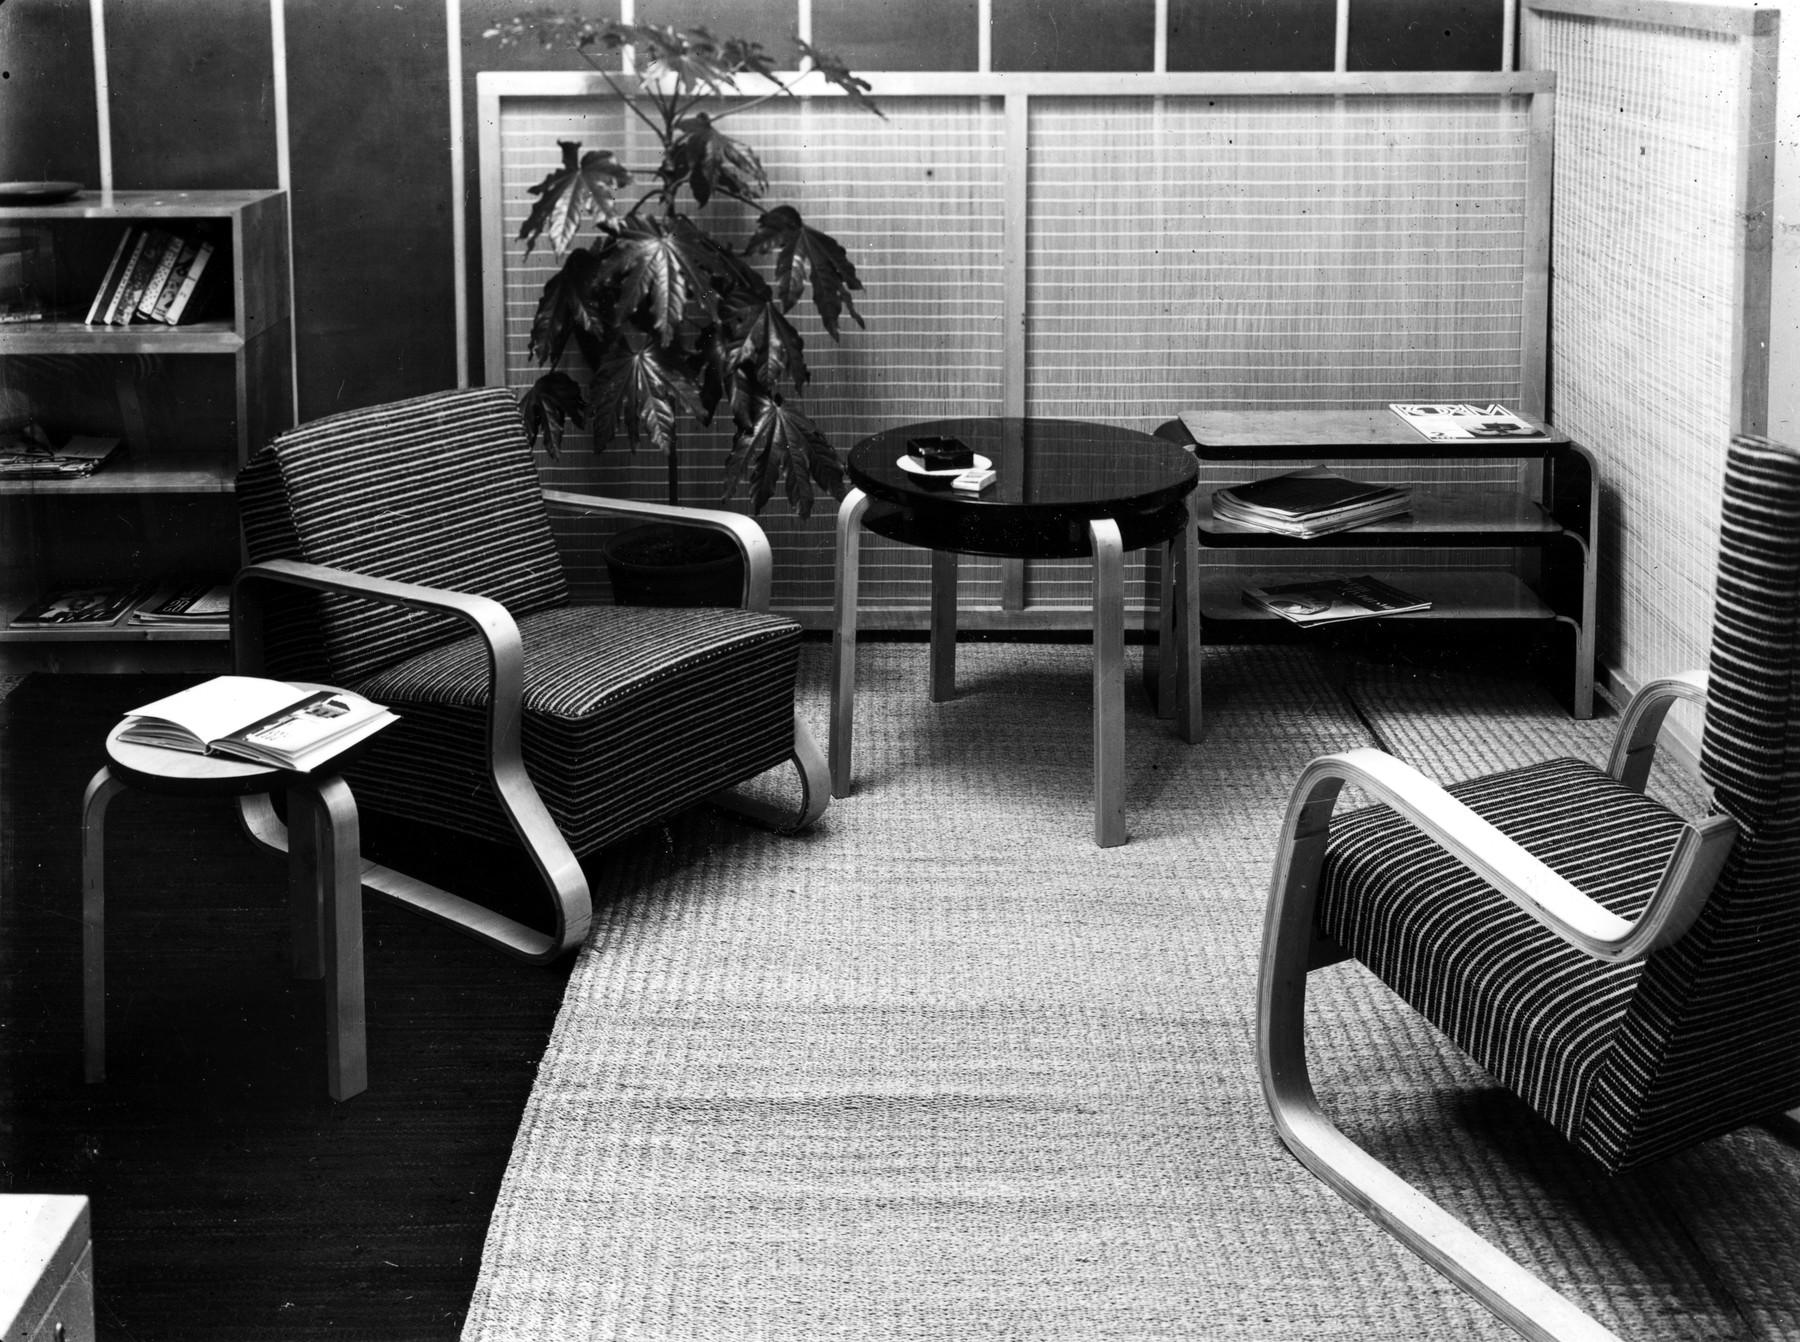 1845963 Fabianinkatu first Artek store in Helsinki 1936 master